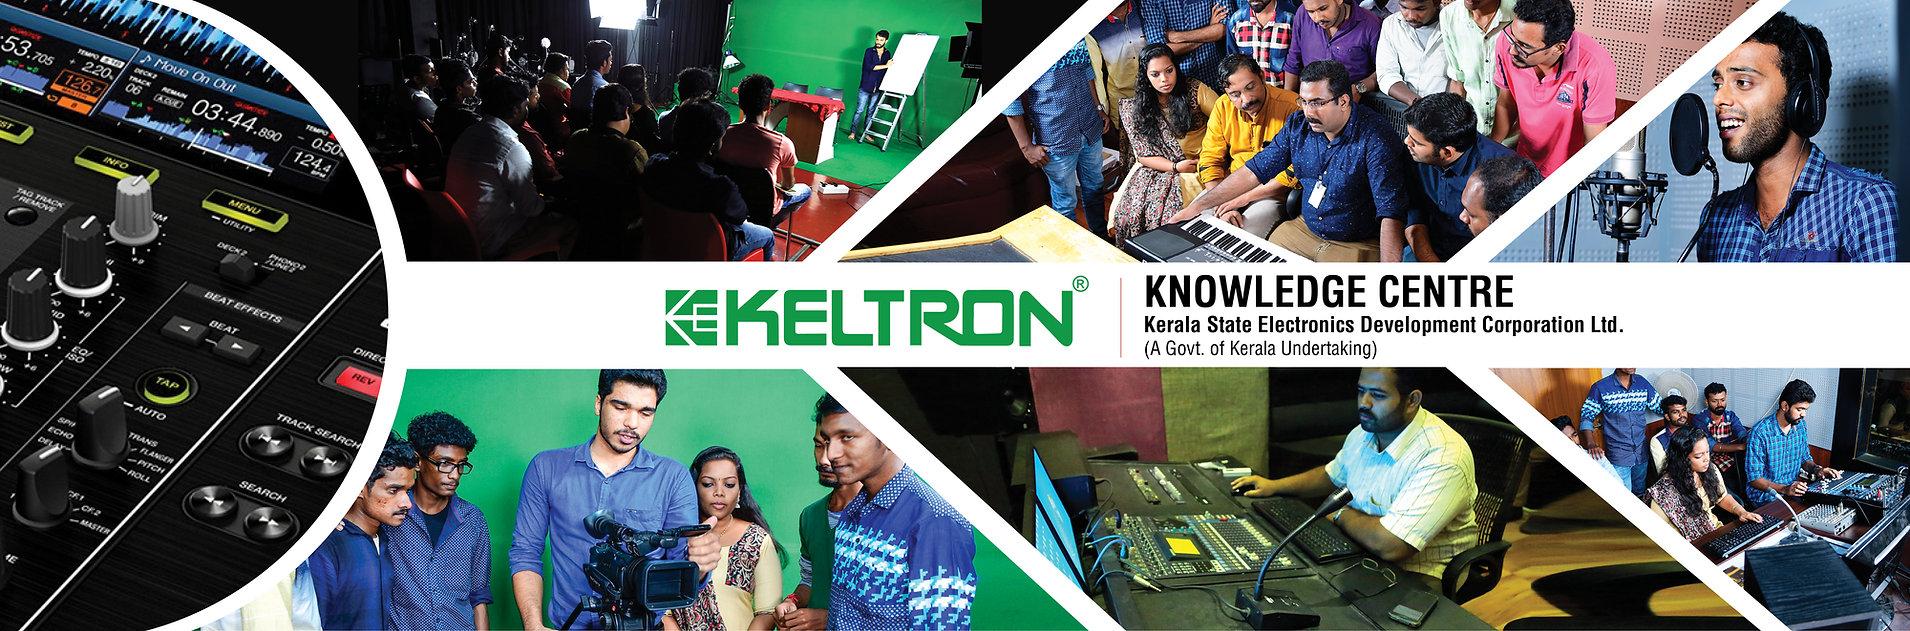 Keltron Knowledge Center, Chengannur